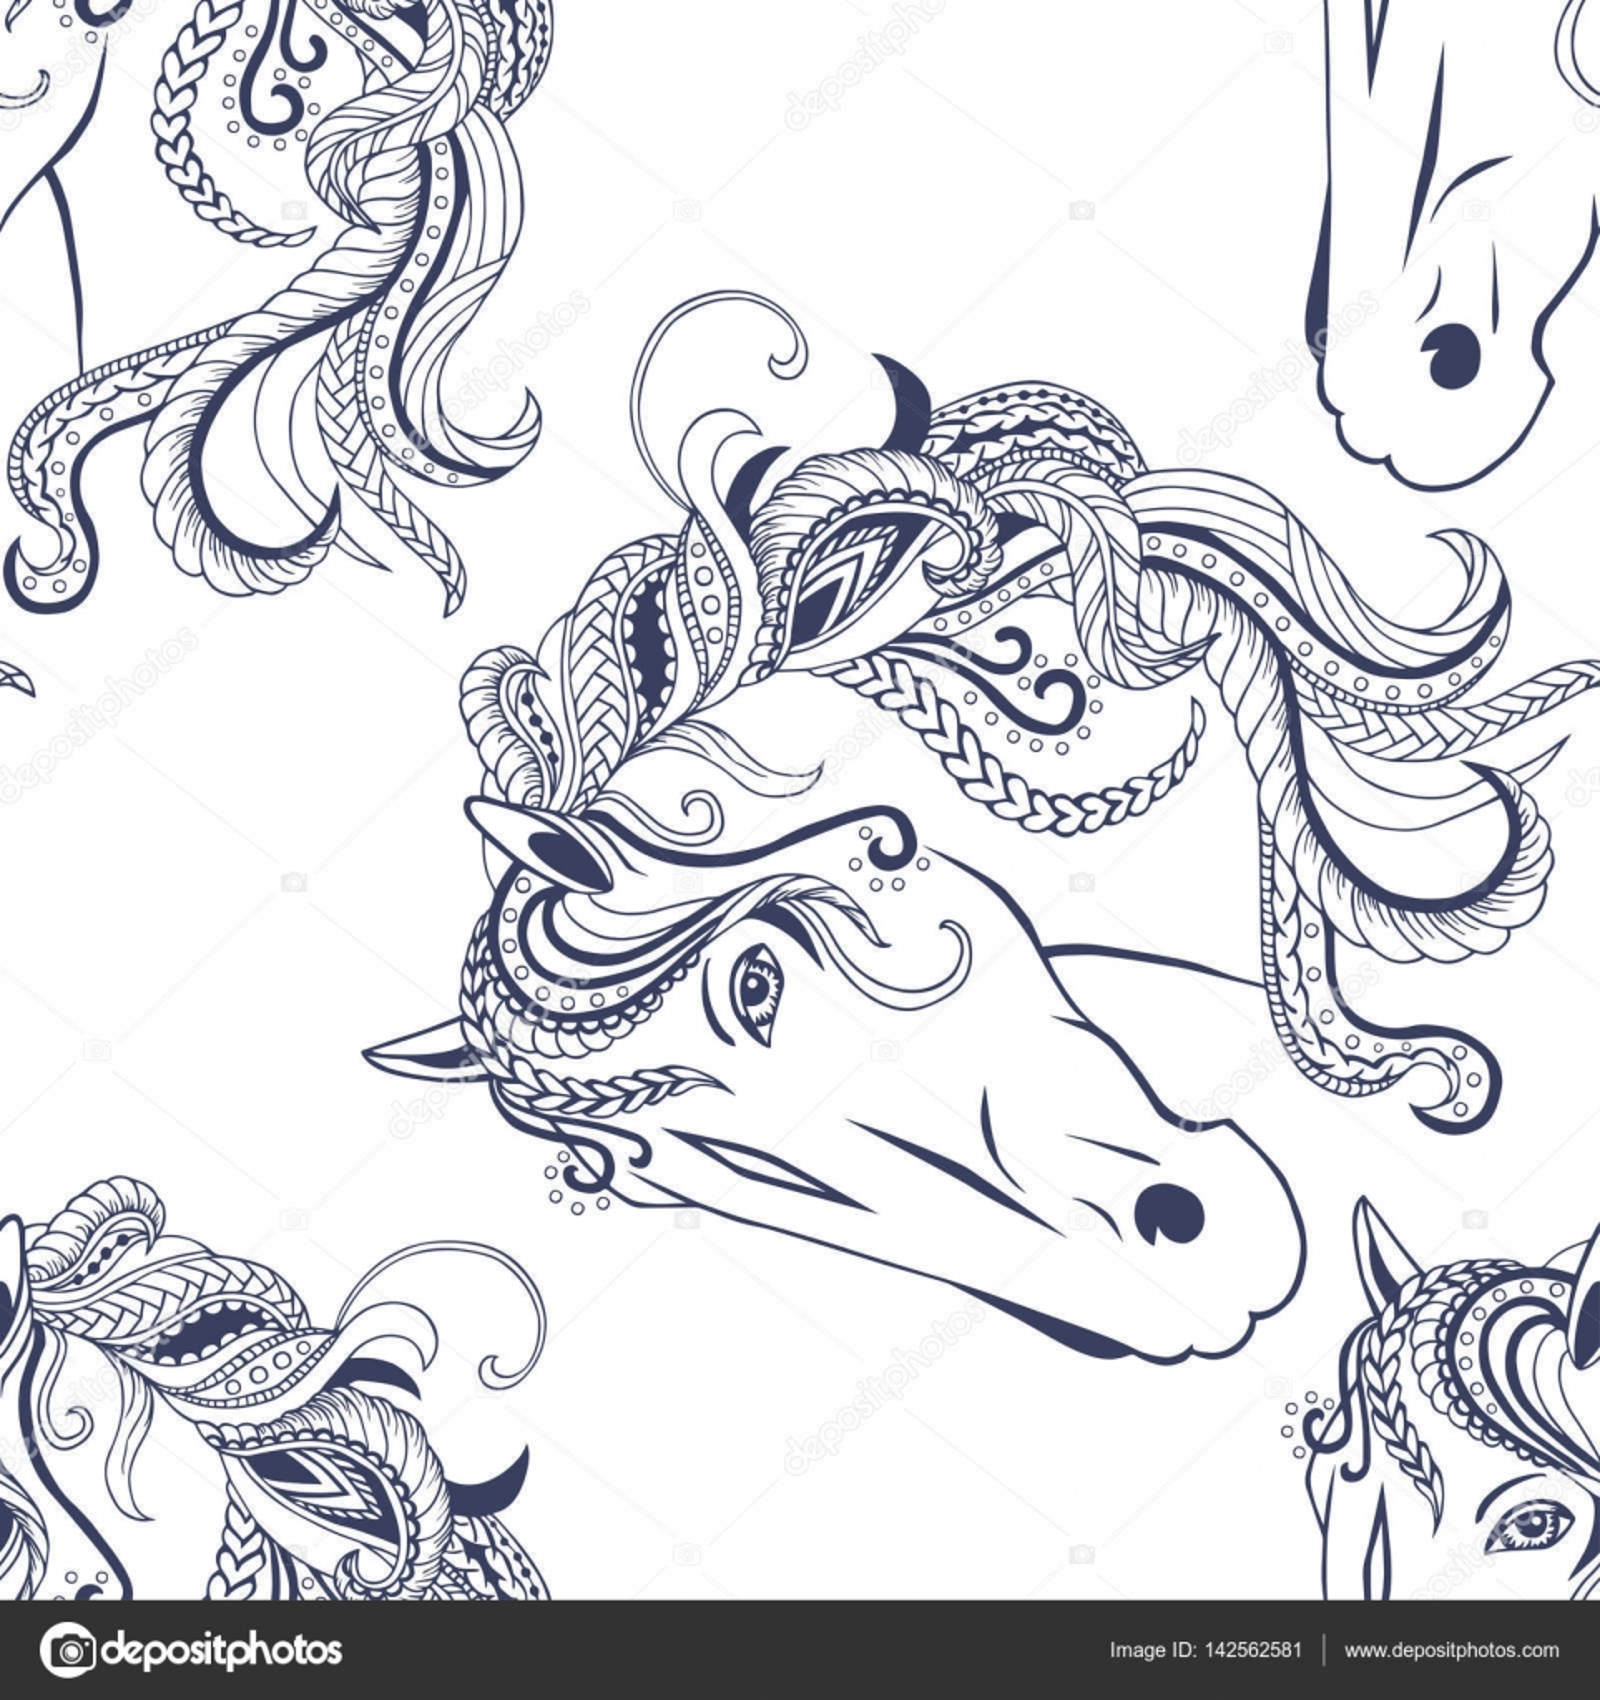 Seamless Pattern With Hand Drawn White Ornate Horse Head Vector Stock Vector C Nataliavarlamova 142562581